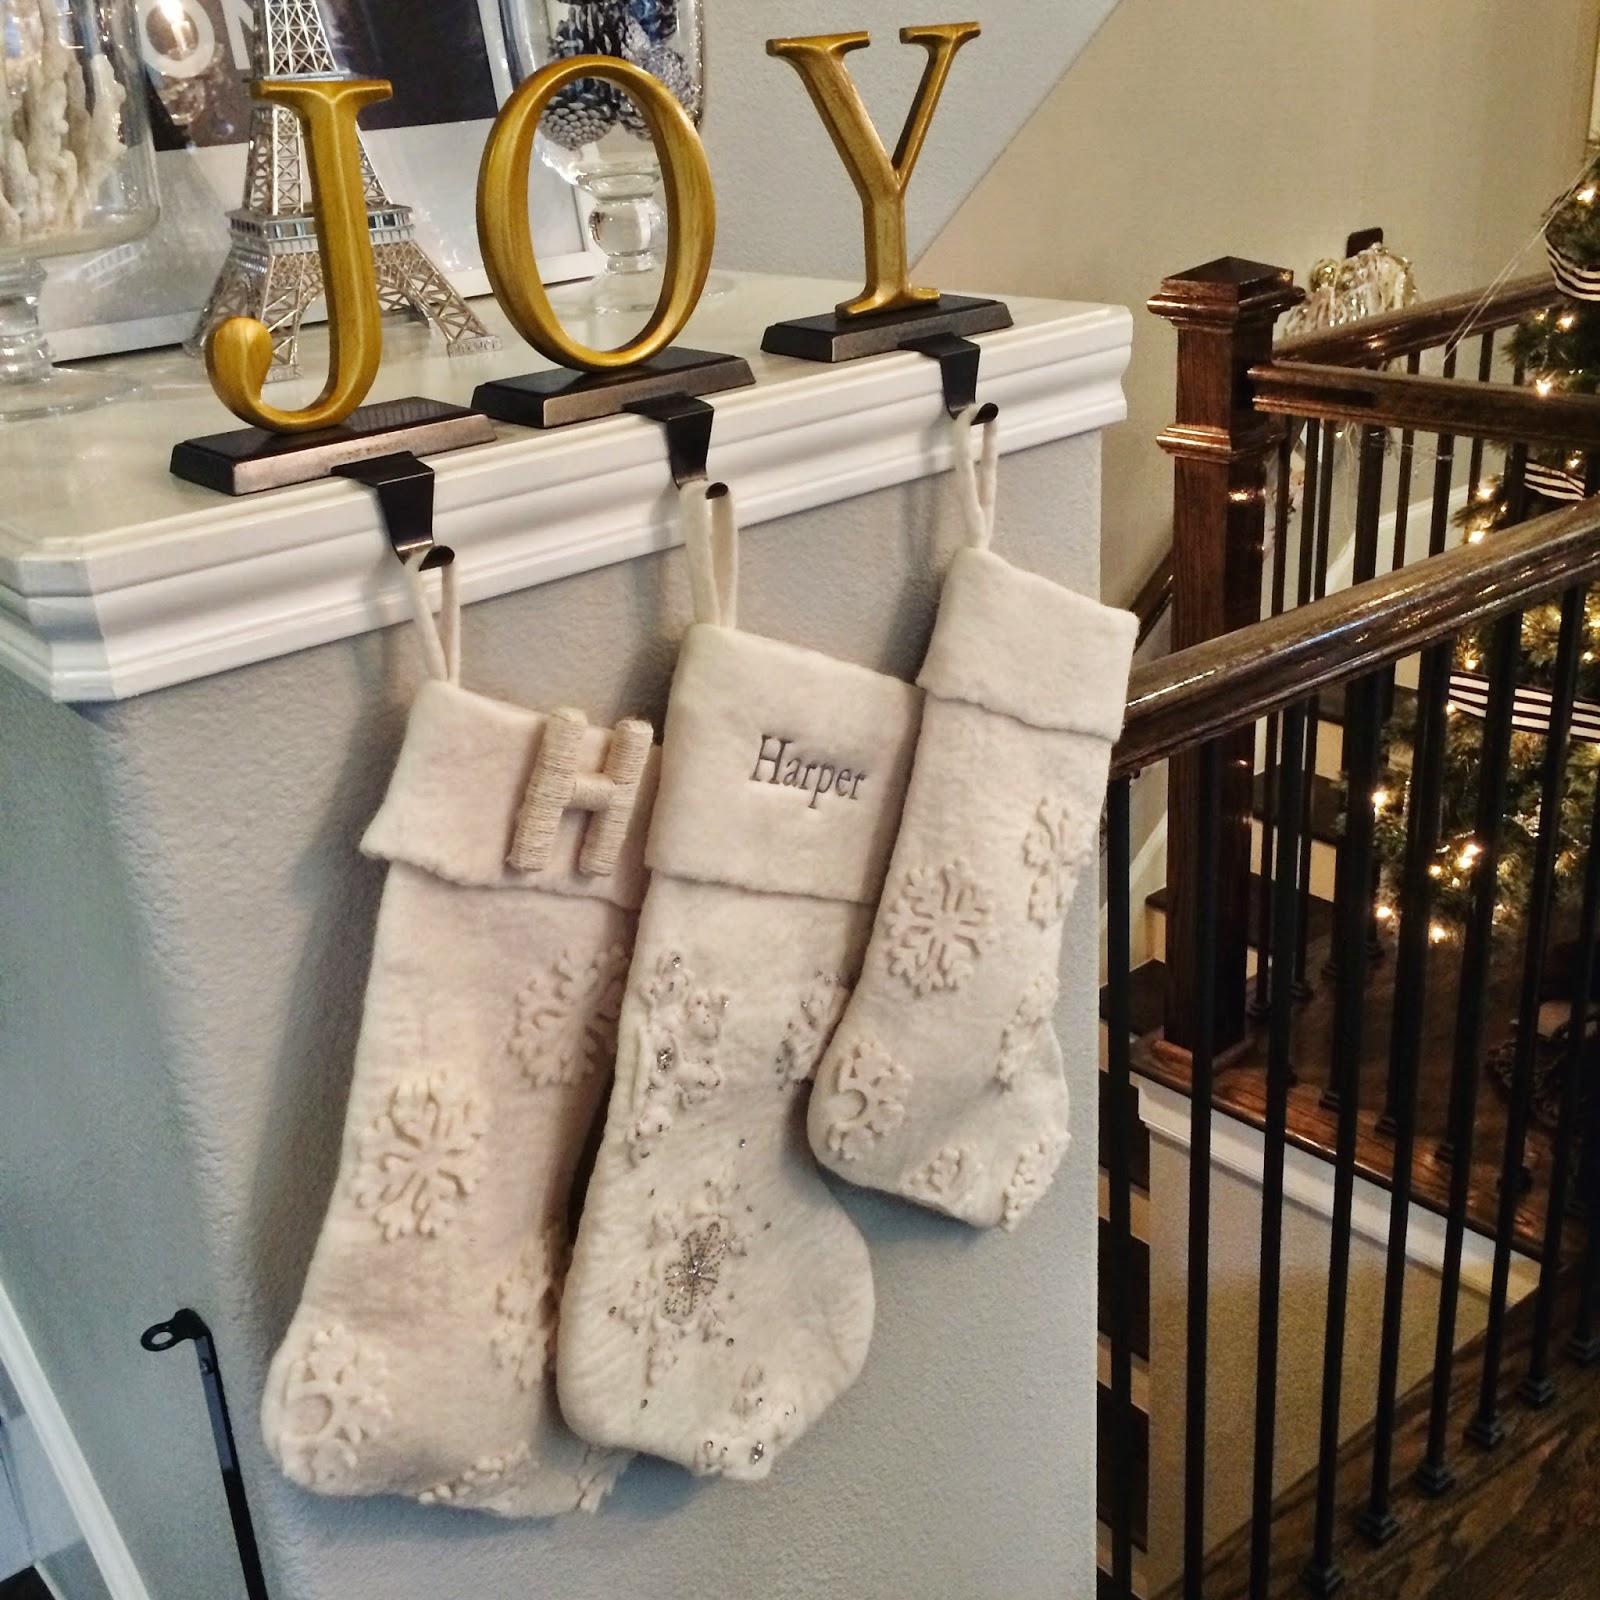 Veronika's Blushing: Our Home, At Christmas